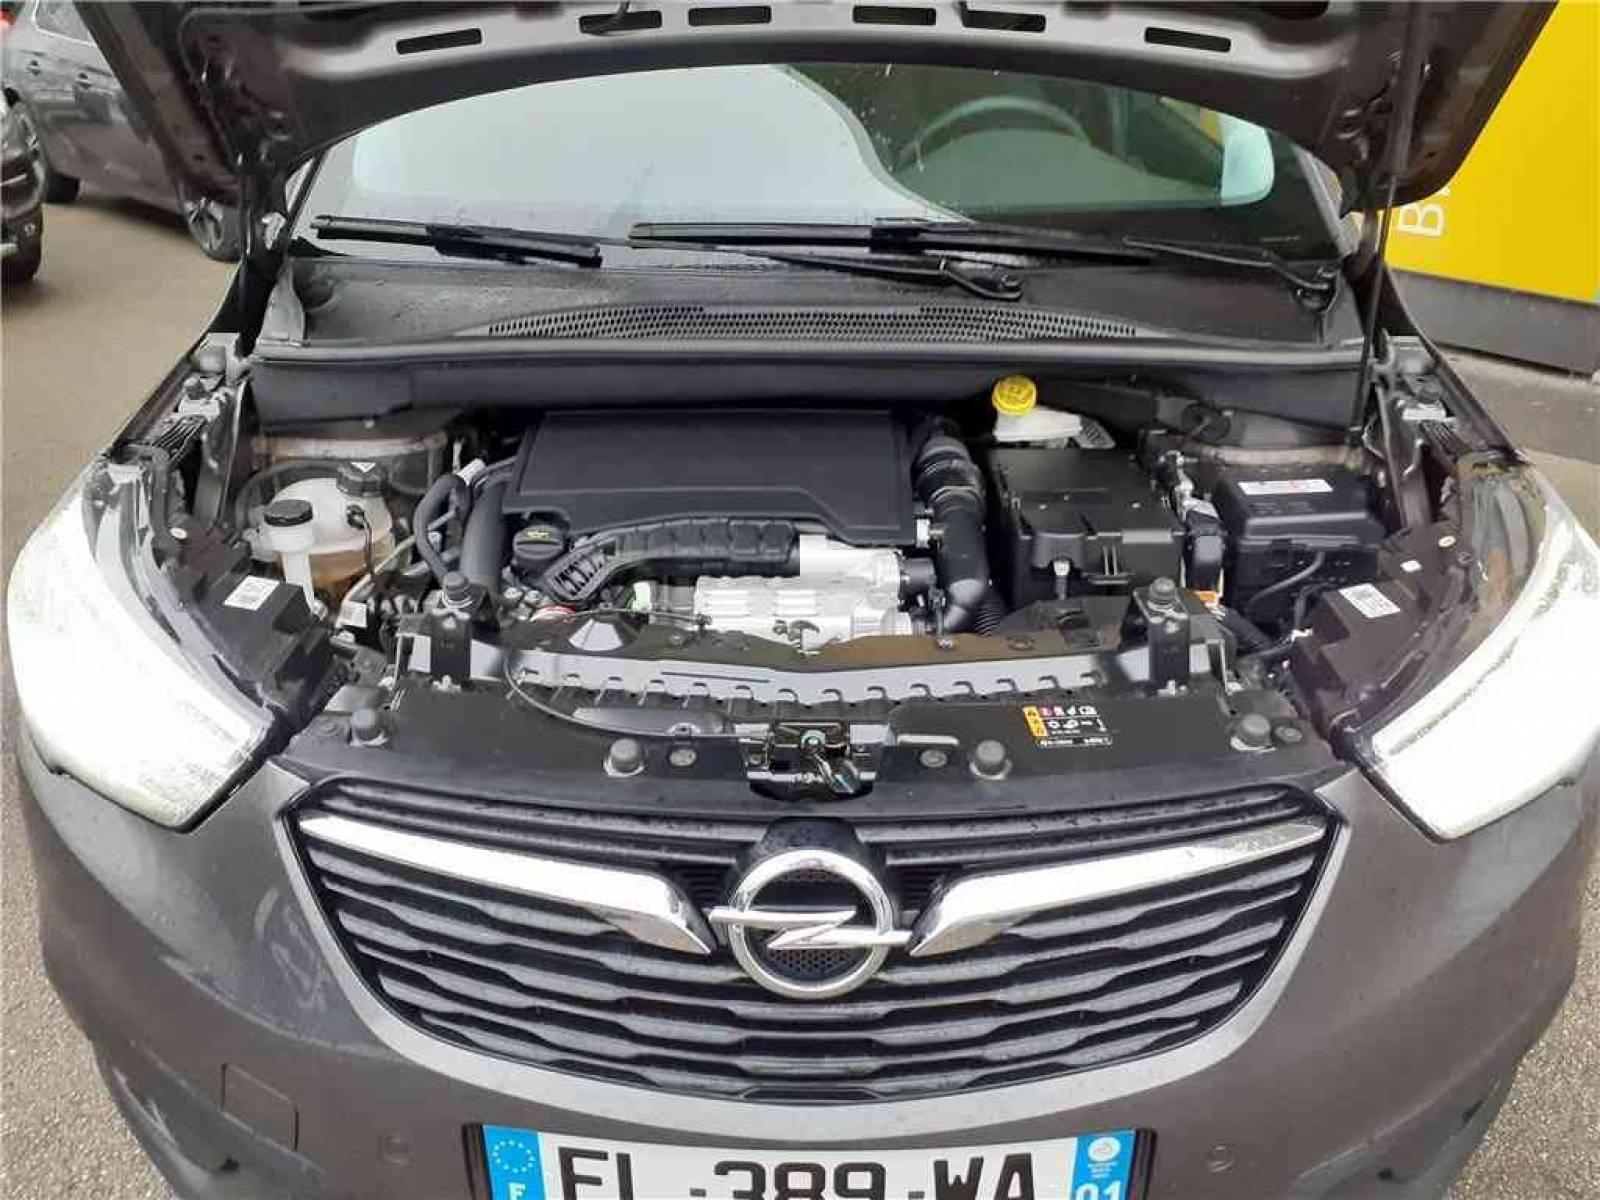 OPEL Crossland X 1.2 Turbo 110 ch - véhicule d'occasion - Groupe Guillet - Opel Magicauto - Chalon-sur-Saône - 71380 - Saint-Marcel - 13